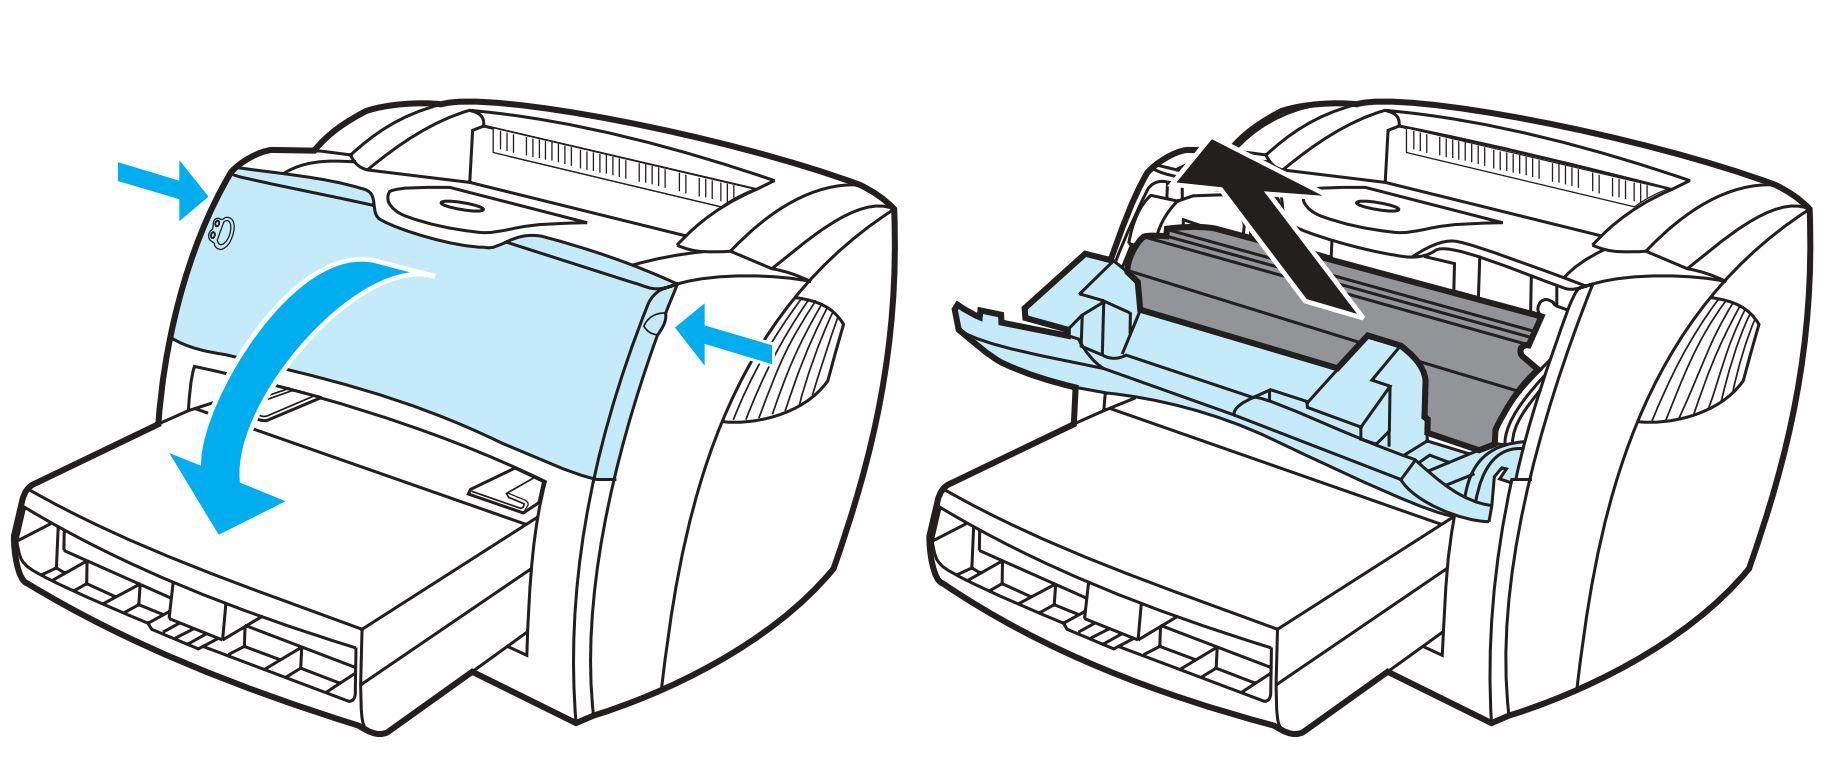 HP LaserJet 1300 HP LaserJet 1300 Maintenance Kit